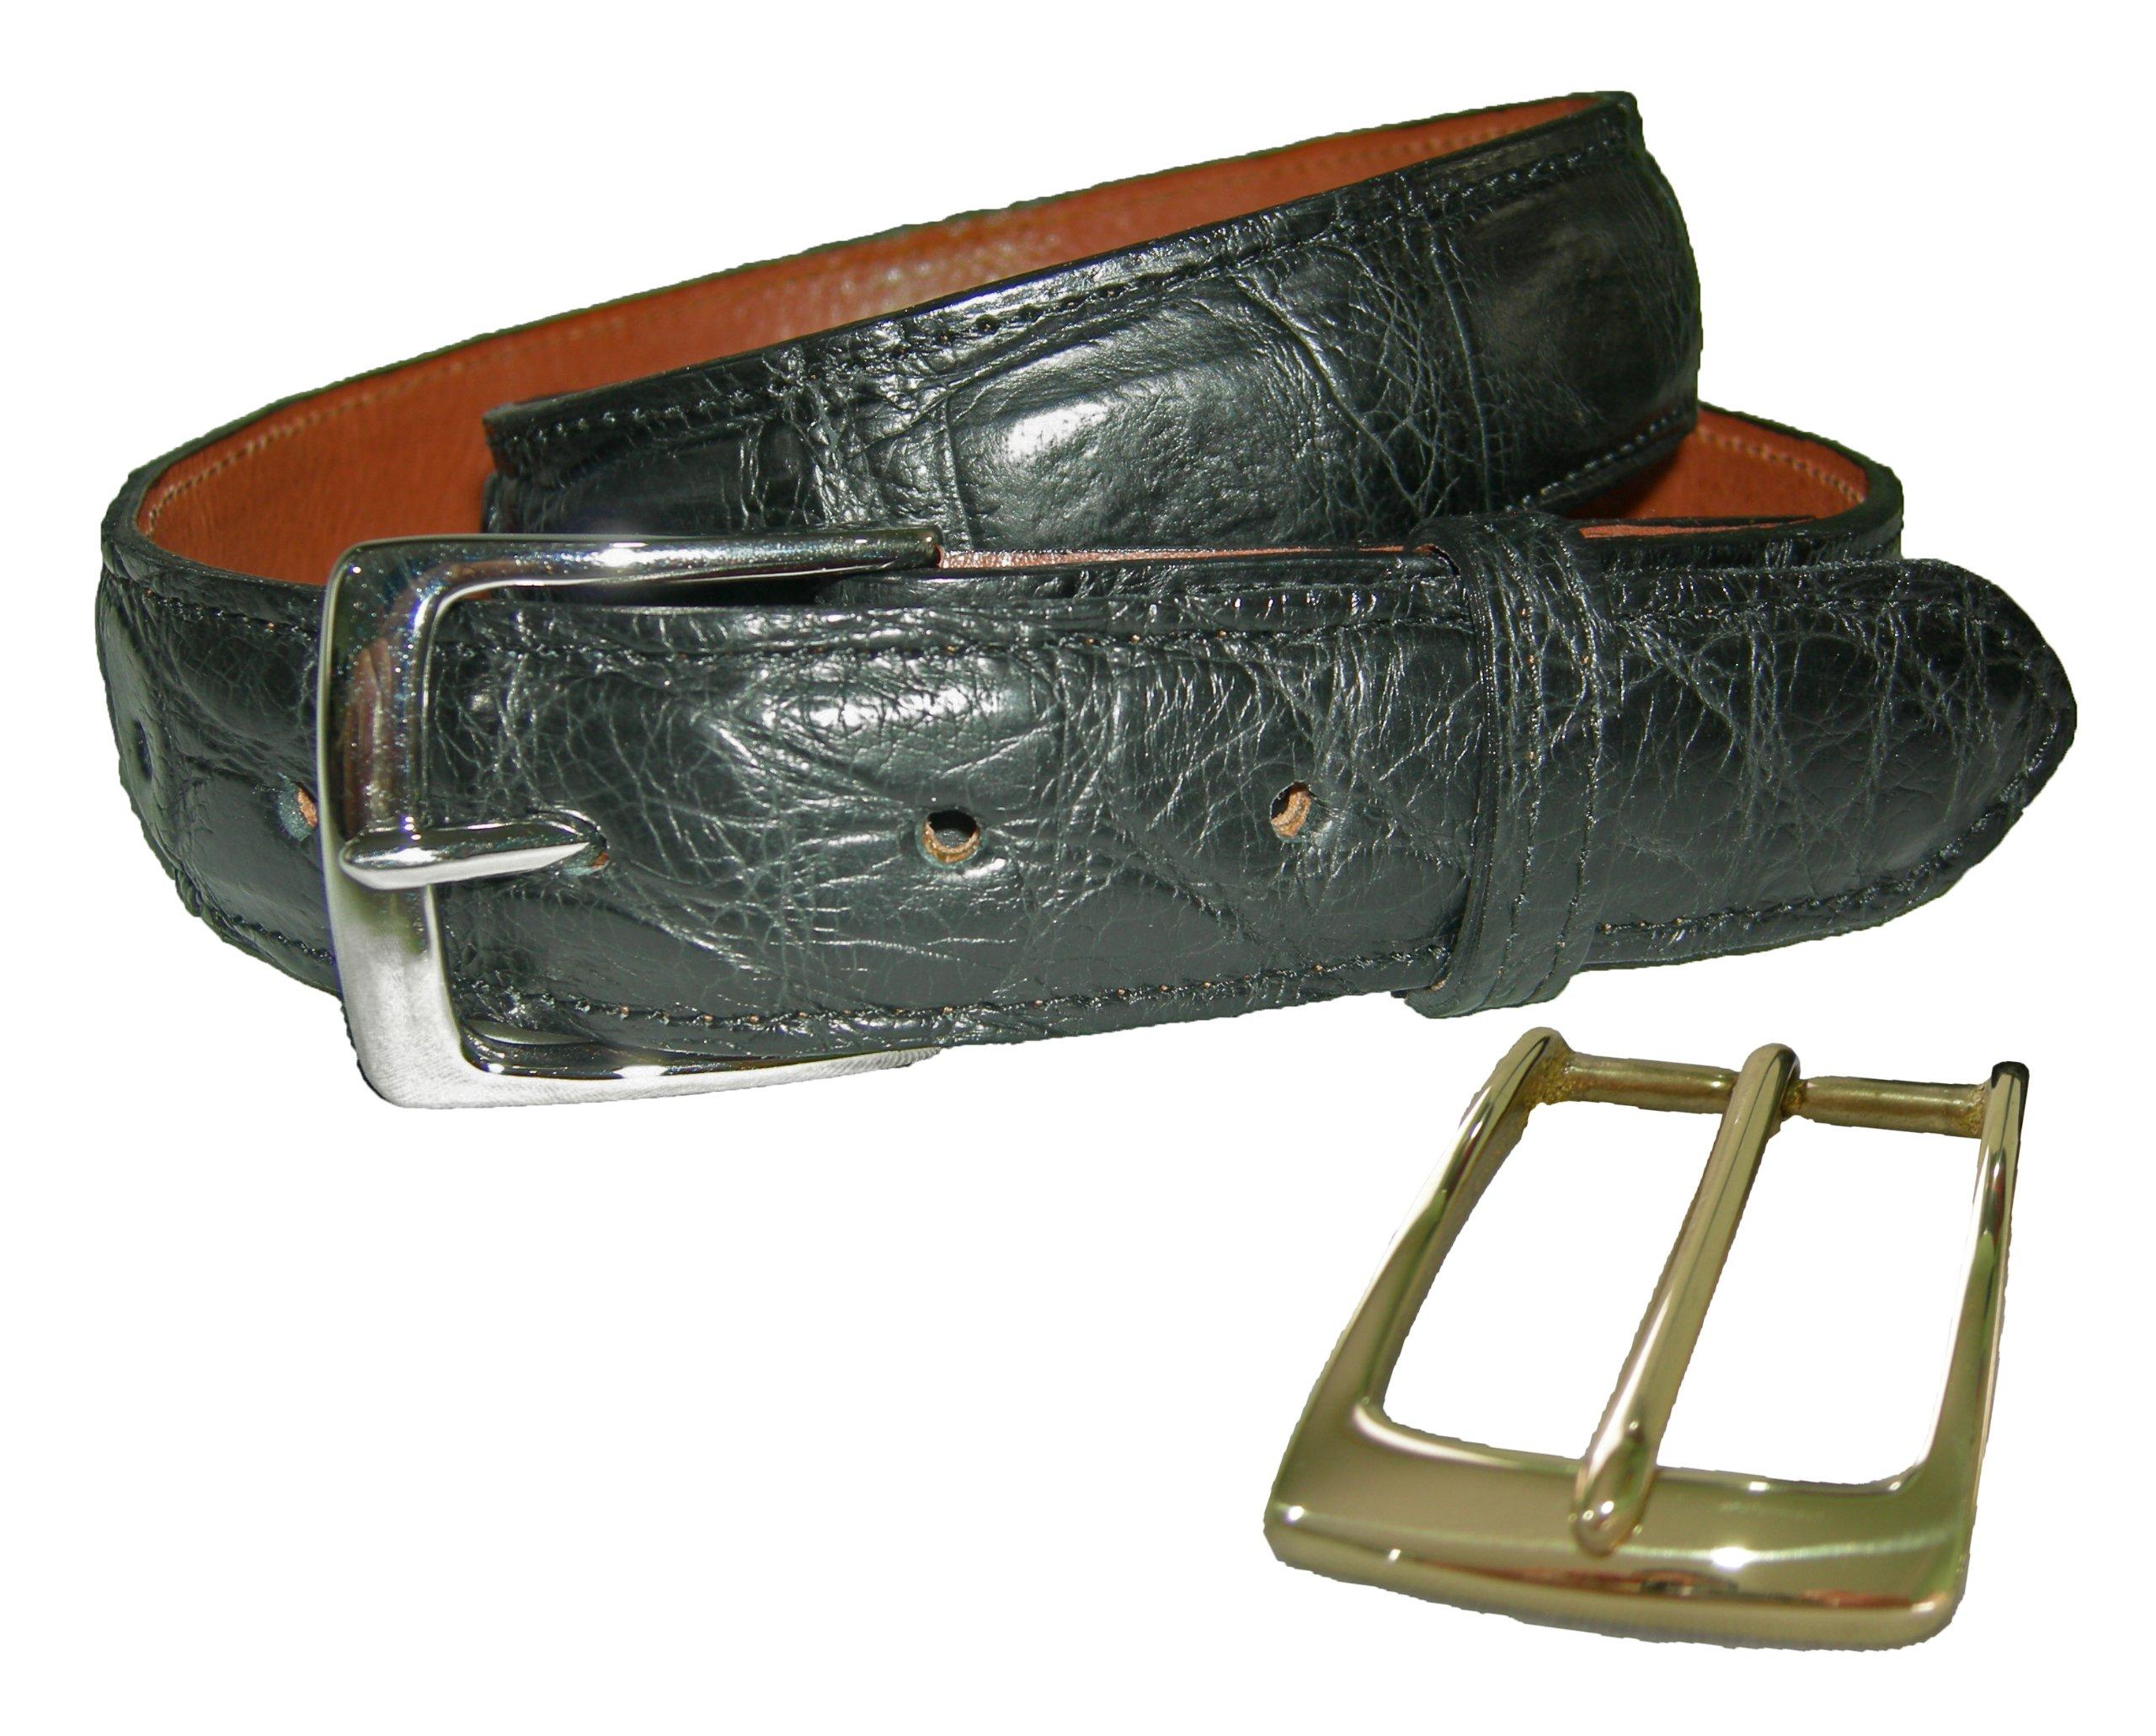 Sultan Genuine Alligator Men's 1-1/4'' Belt - Black Safari (Semi-Gloss) - 36